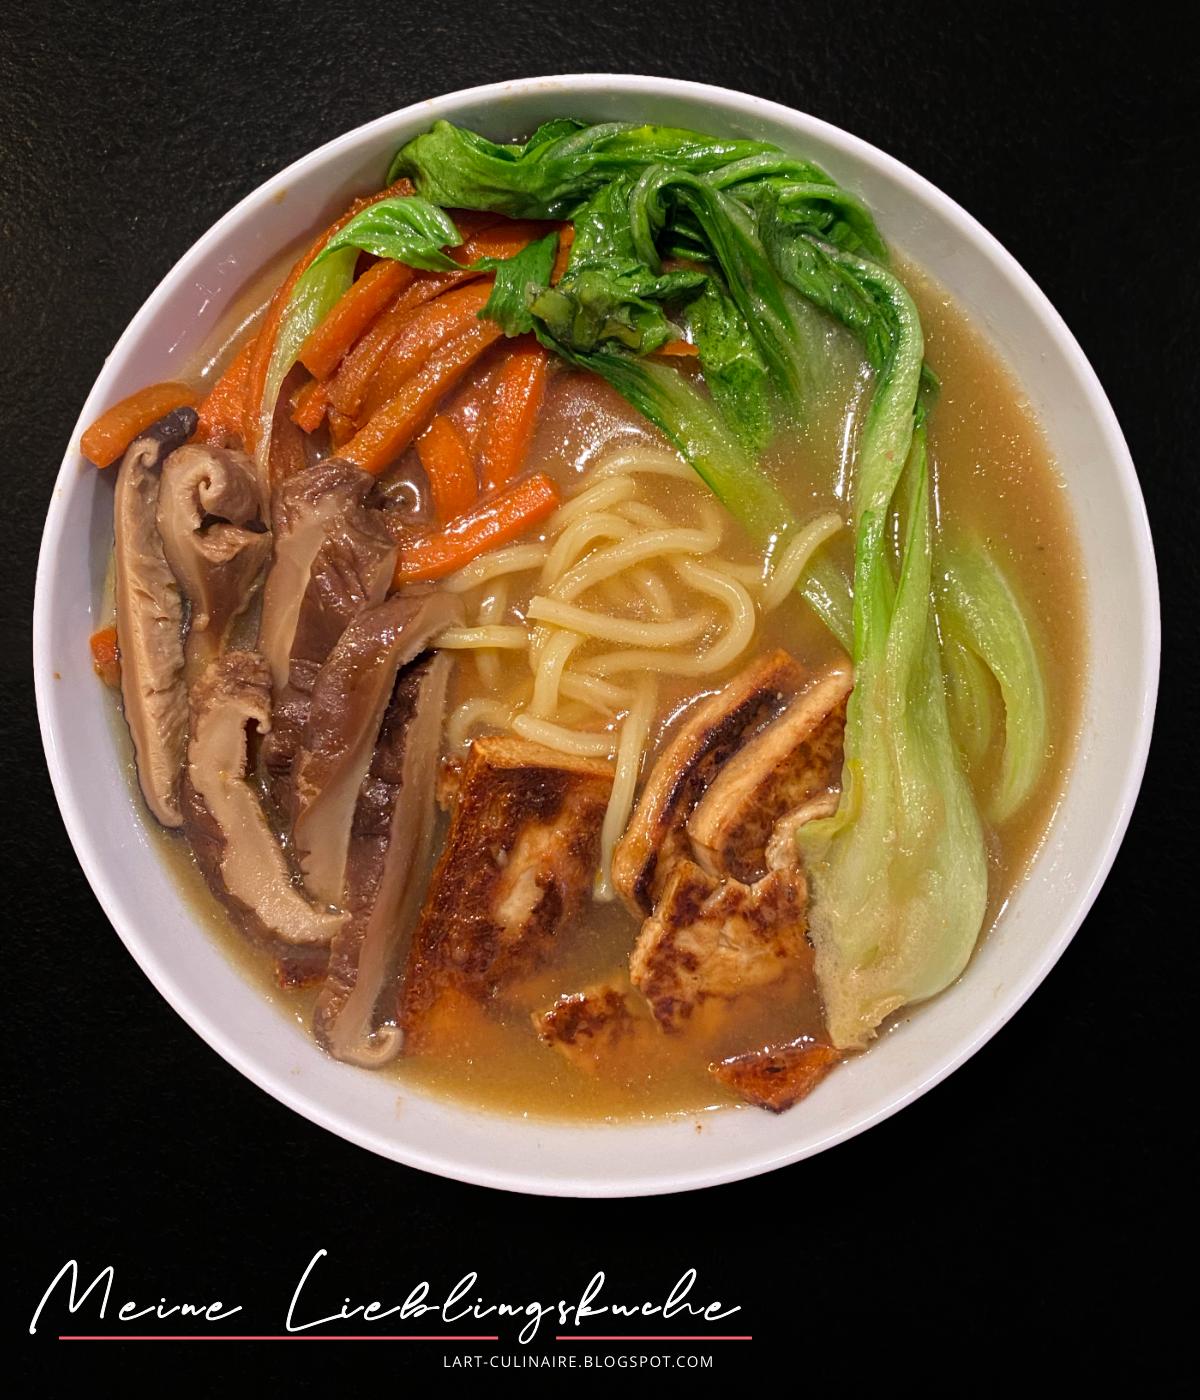 vegane Ramen-Suppe mit Pilzen, Karotten, Tofu und Pak Choi